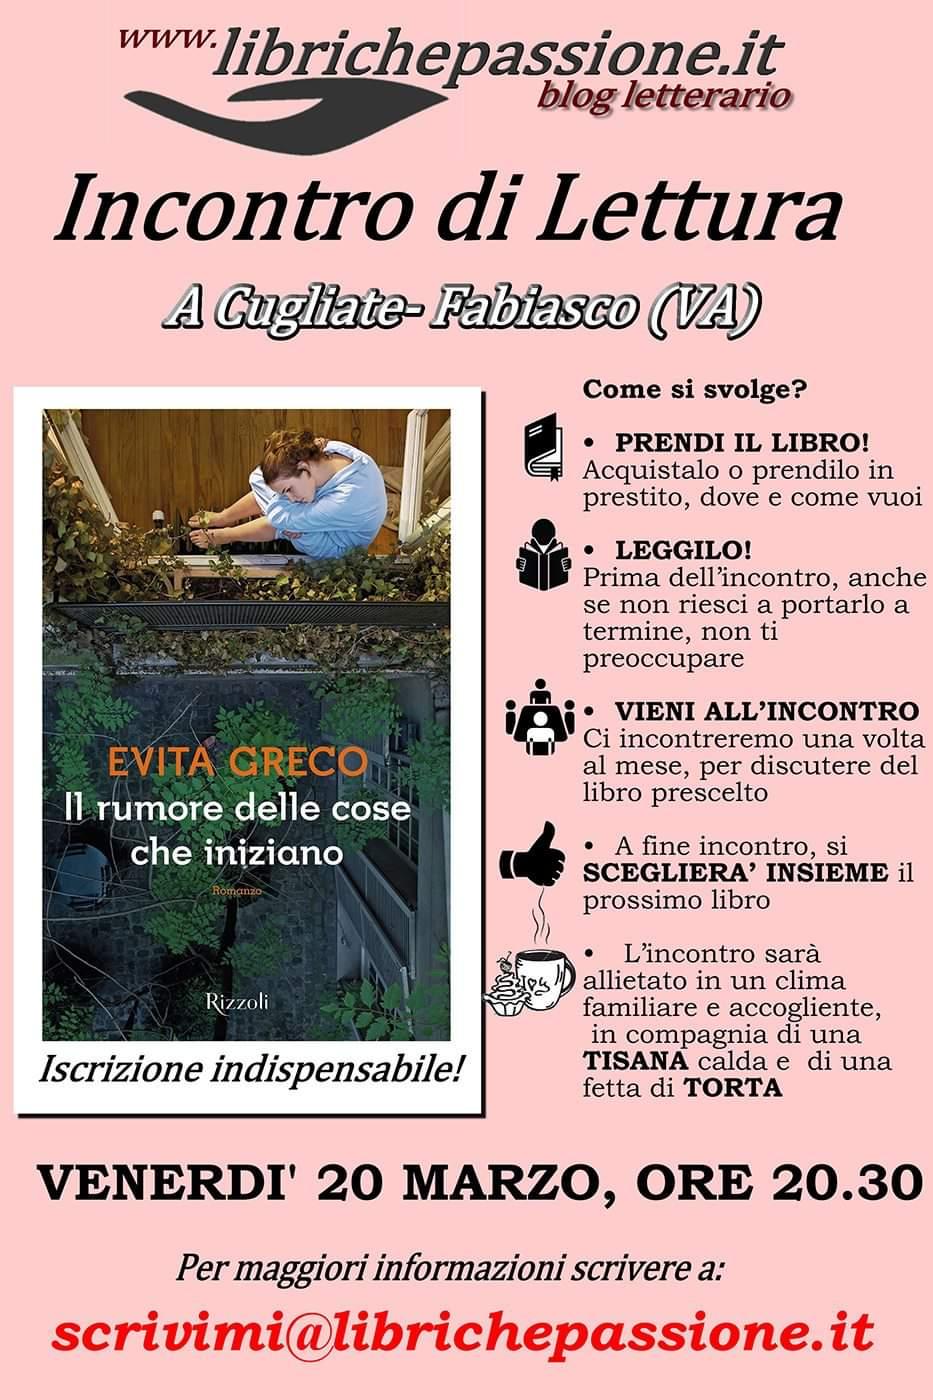 Incontro di lettura: Venerdì 20 Marzo 2020 ore 20:30 a Cugliate Fabiasco.